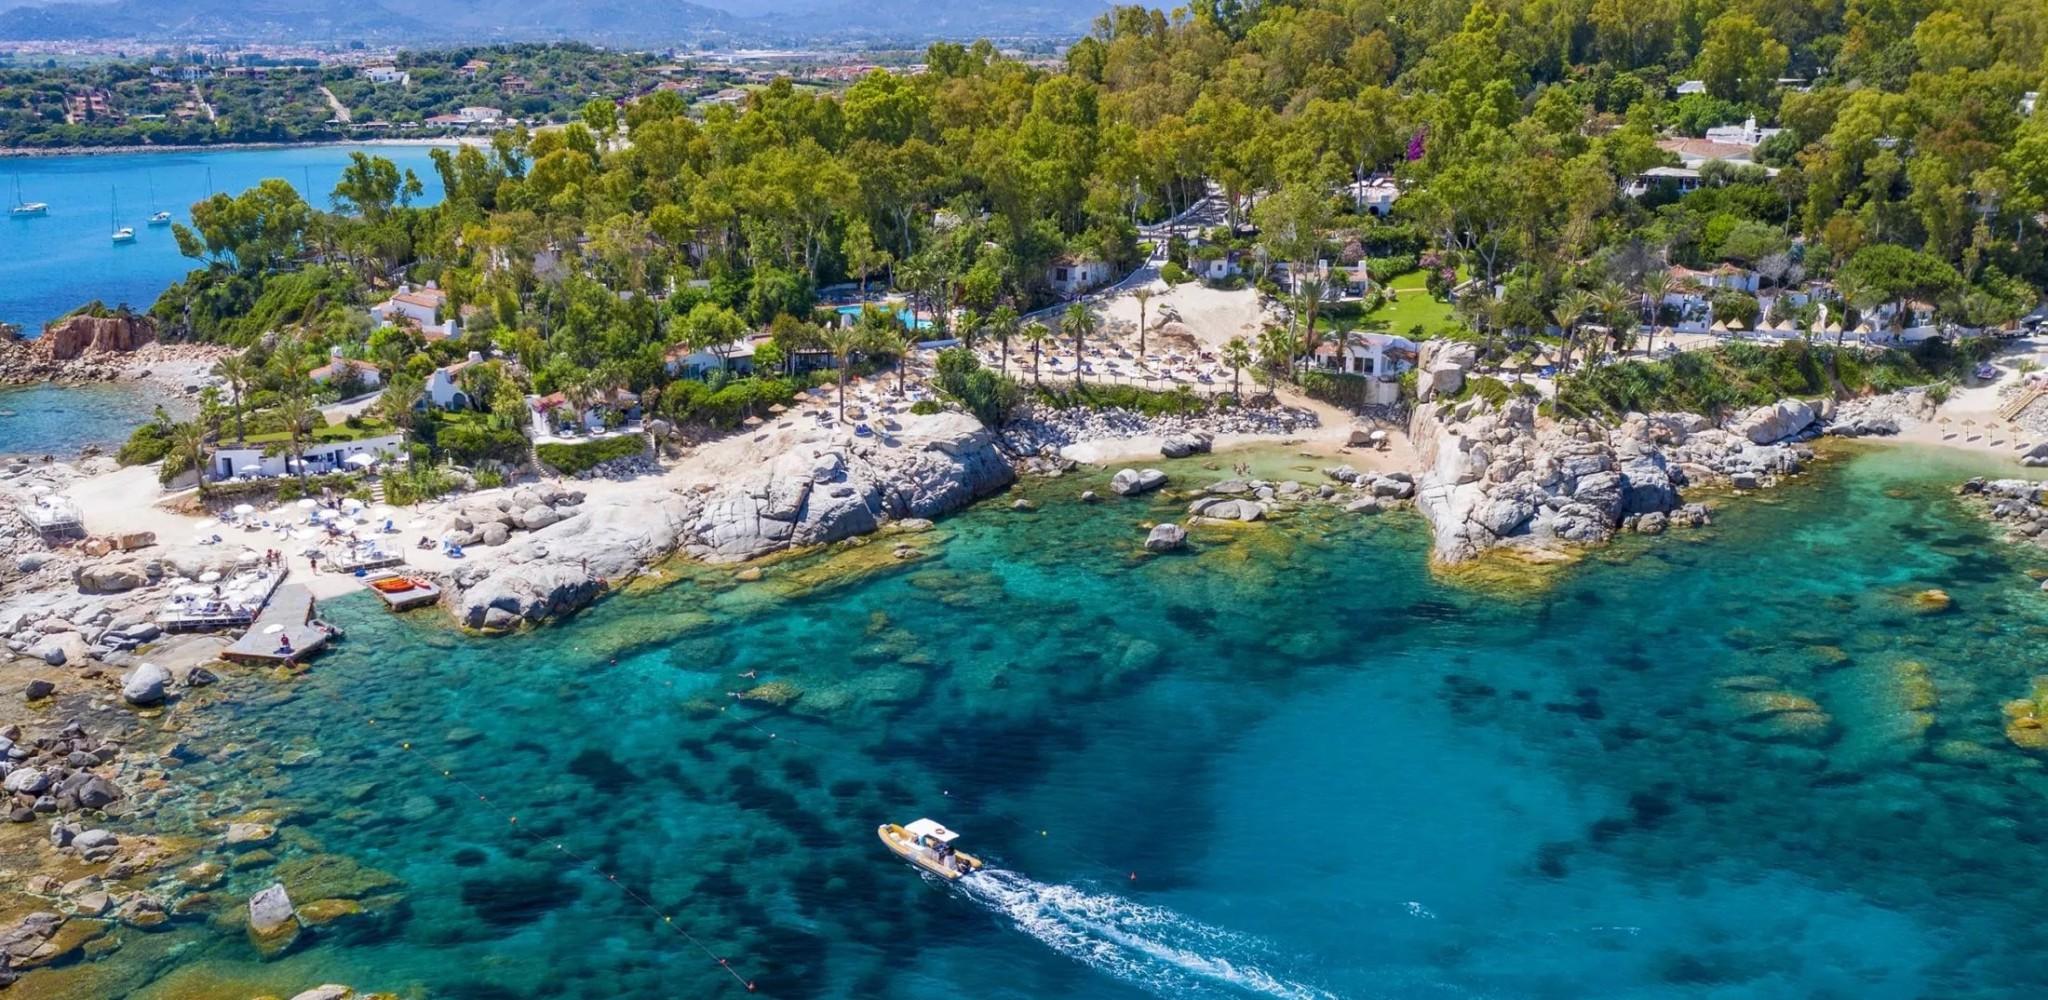 Viaggi Preziosi The Villas of the Arbatax Park Resort copy